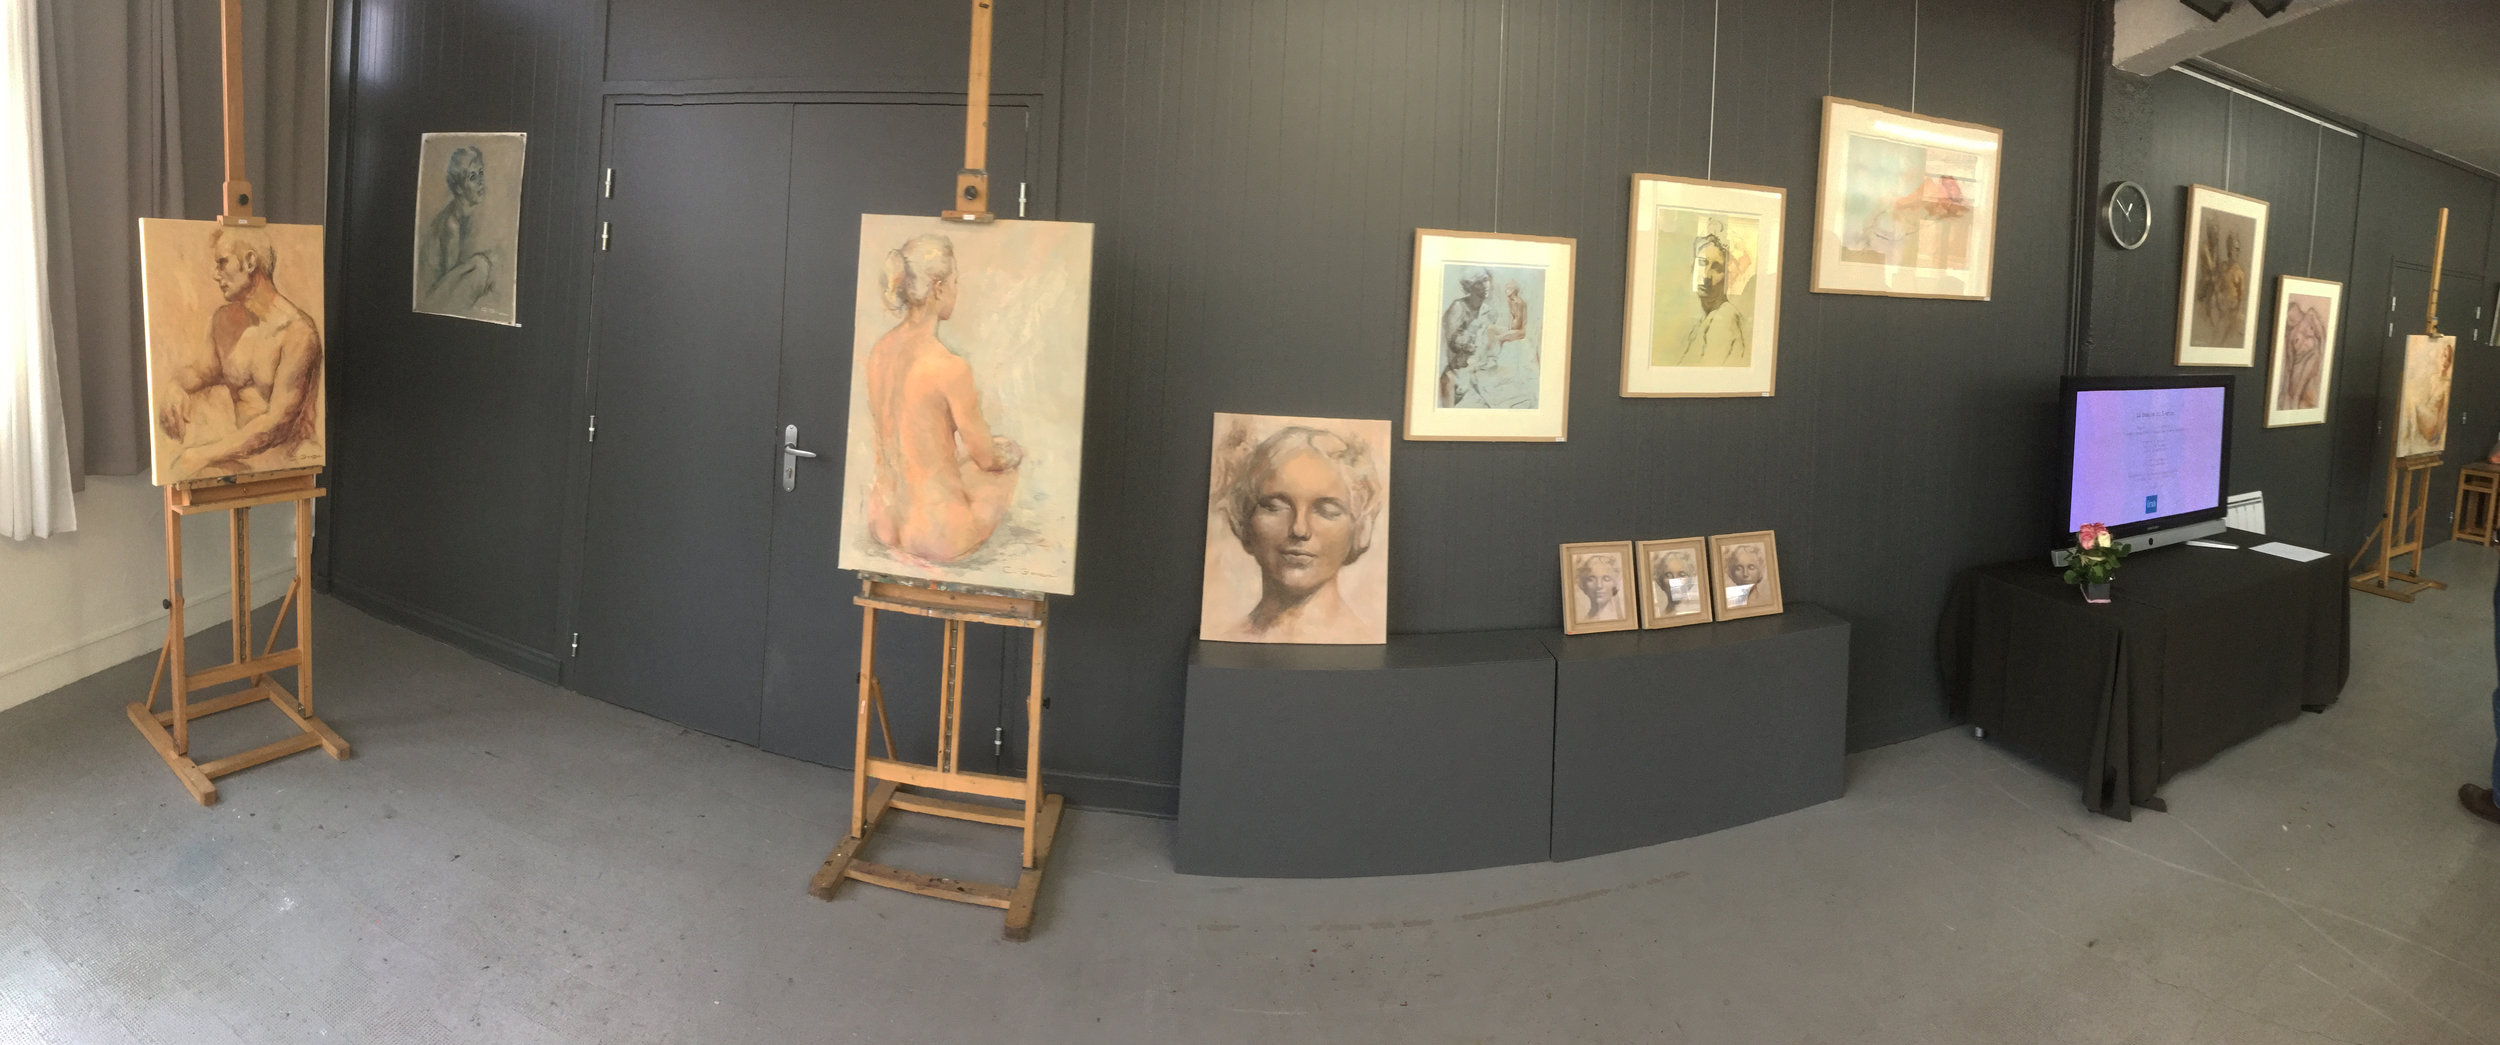 Vue de l'exposition de Cristina Gondolo 2016